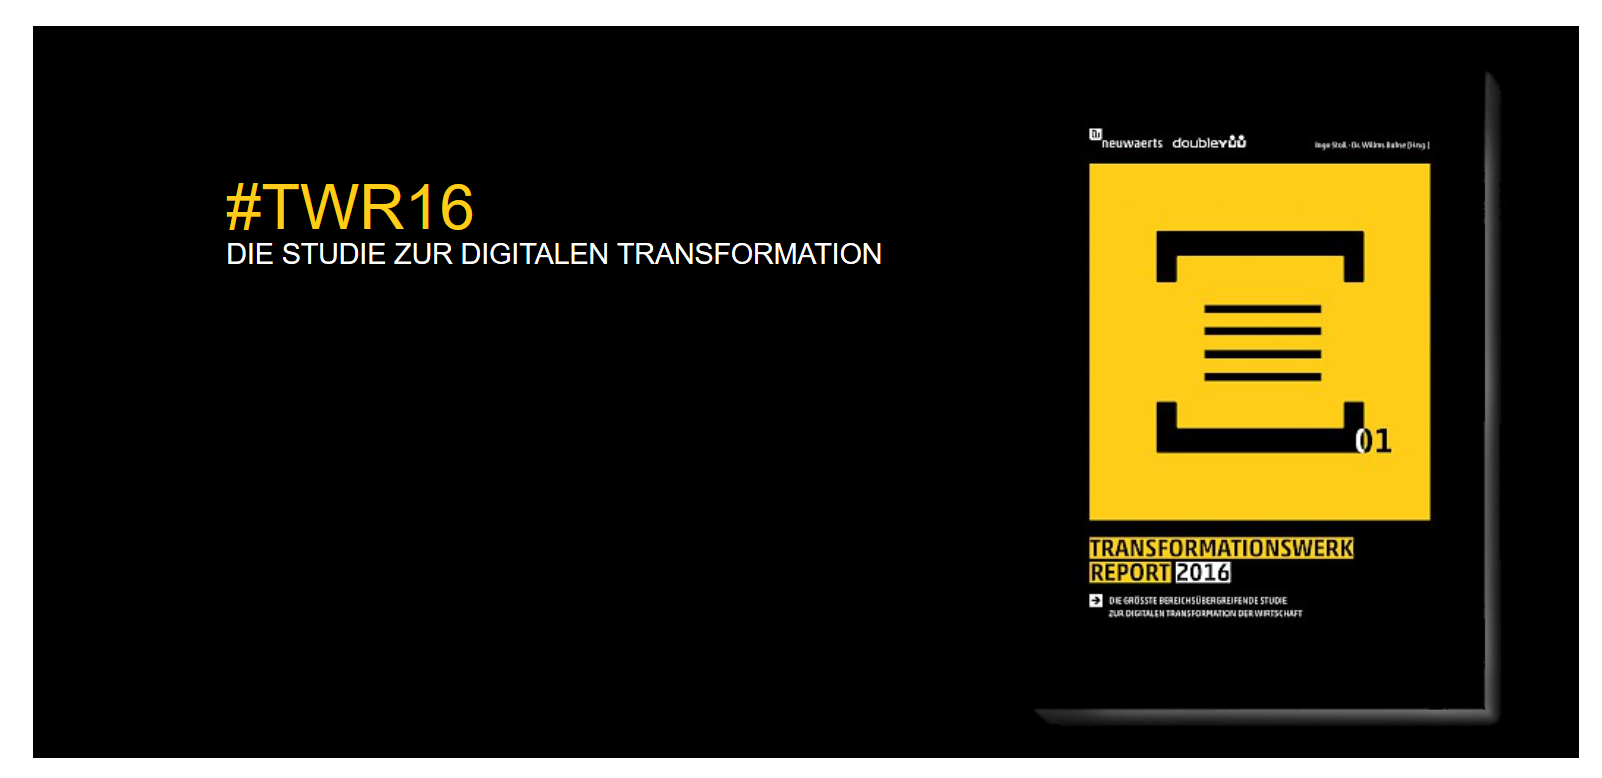 tranforamationwerk_report_2016